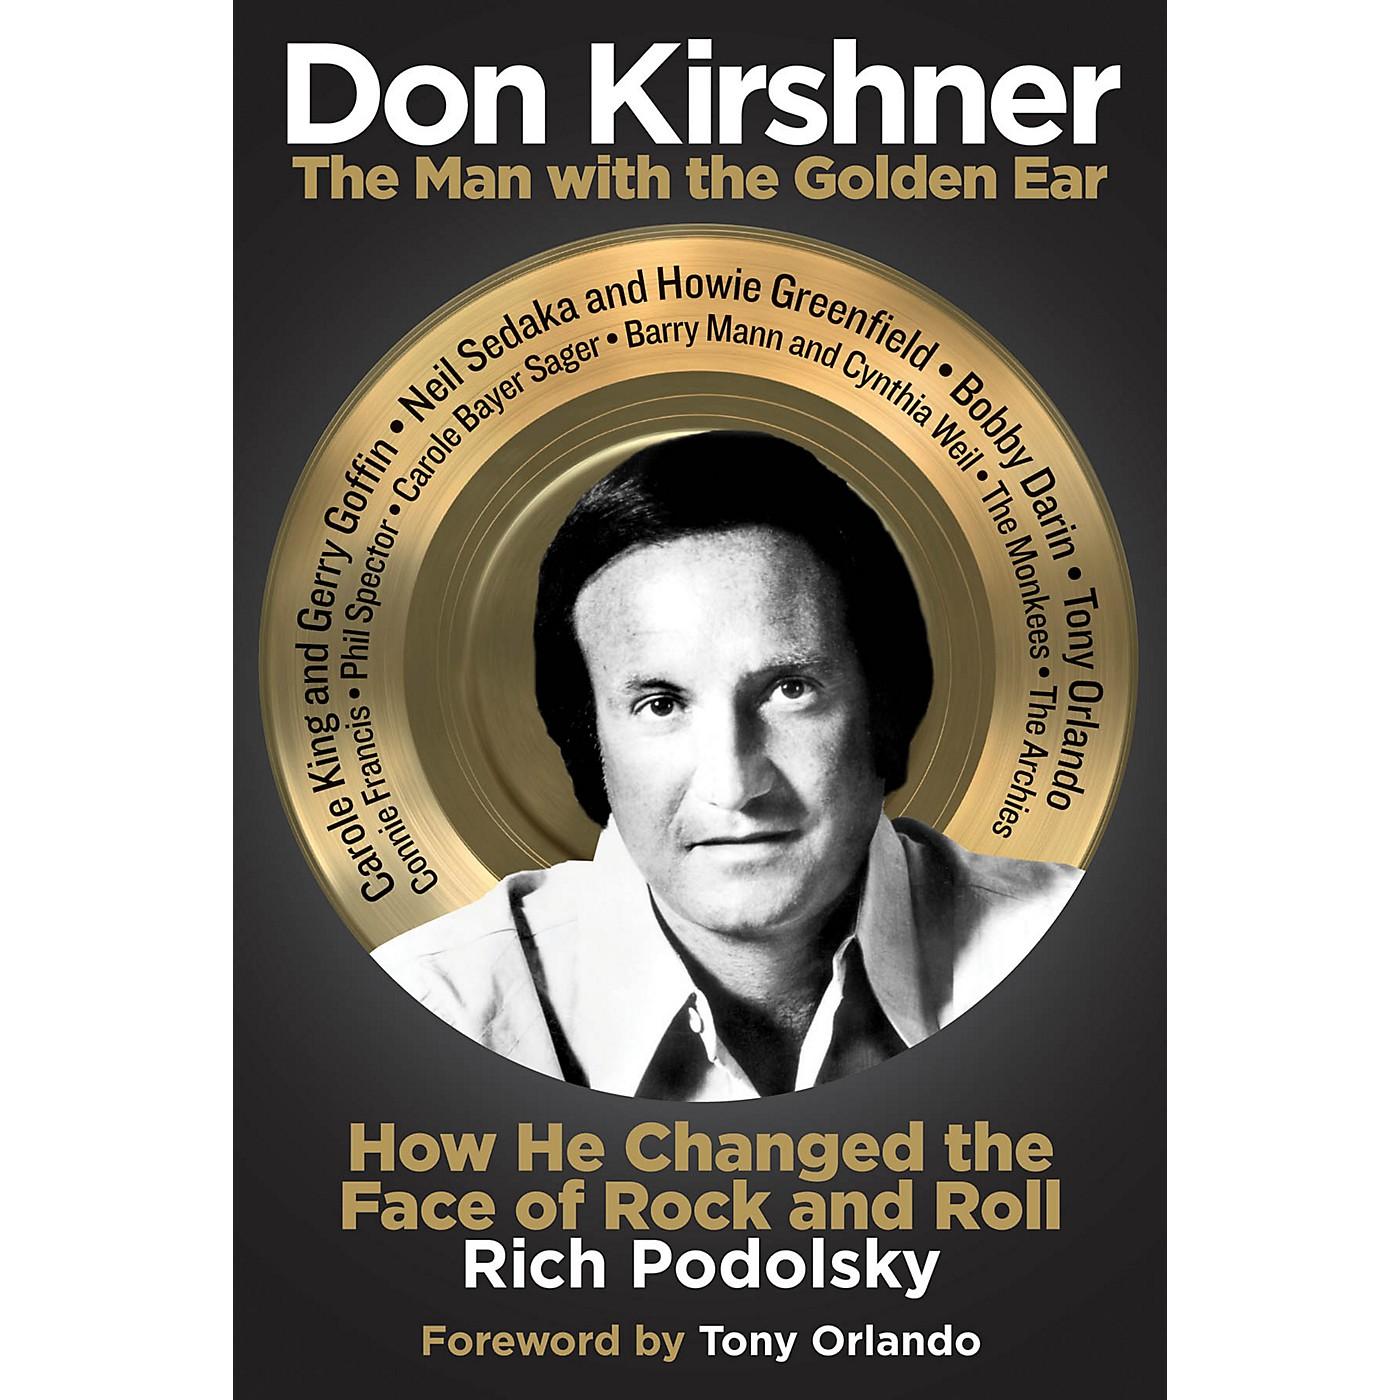 Hal Leonard Don Kirshner Book Series Hardcover Written by Rich Podolsky thumbnail